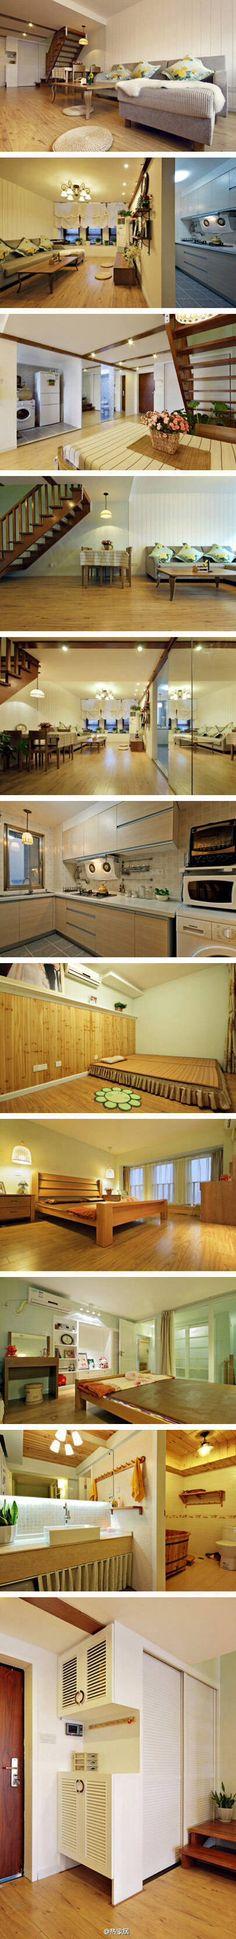 Japanese style loft